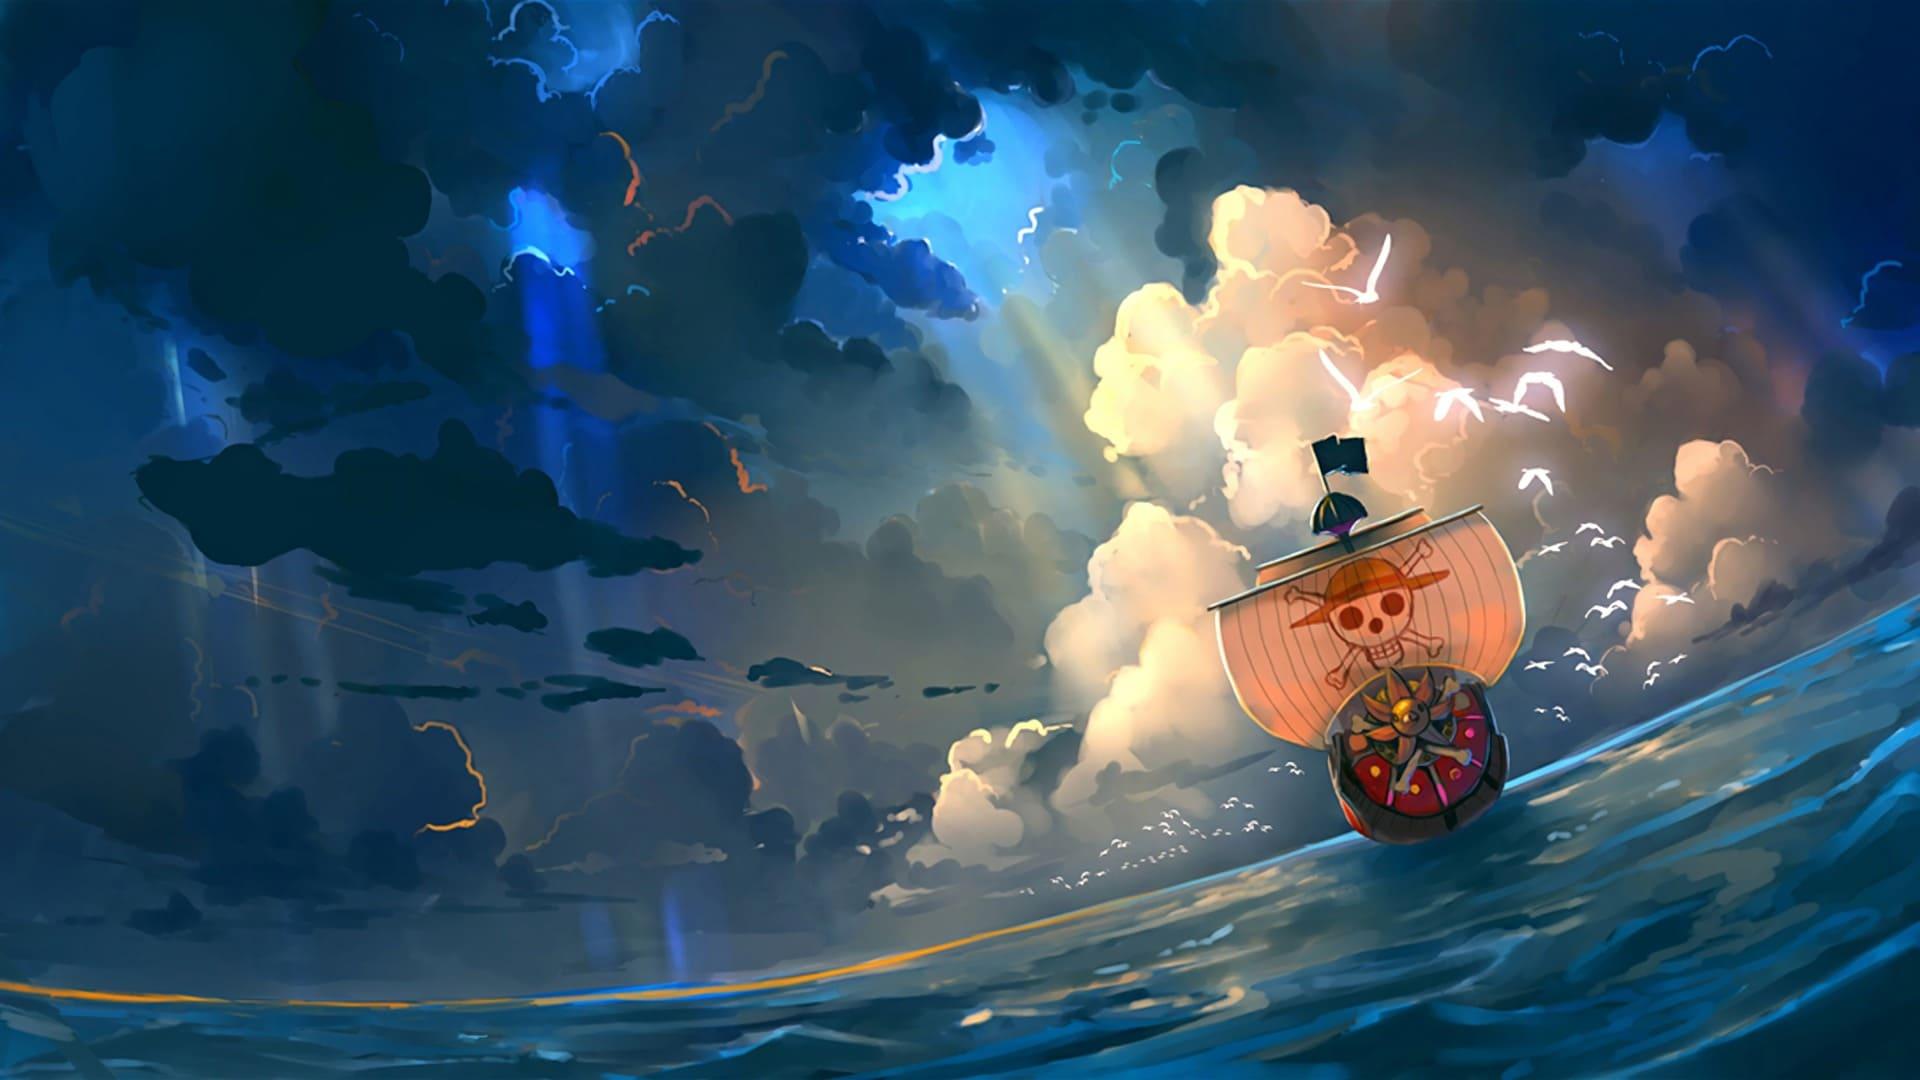 Top 65 One Piece Wallpapers 4k Hd